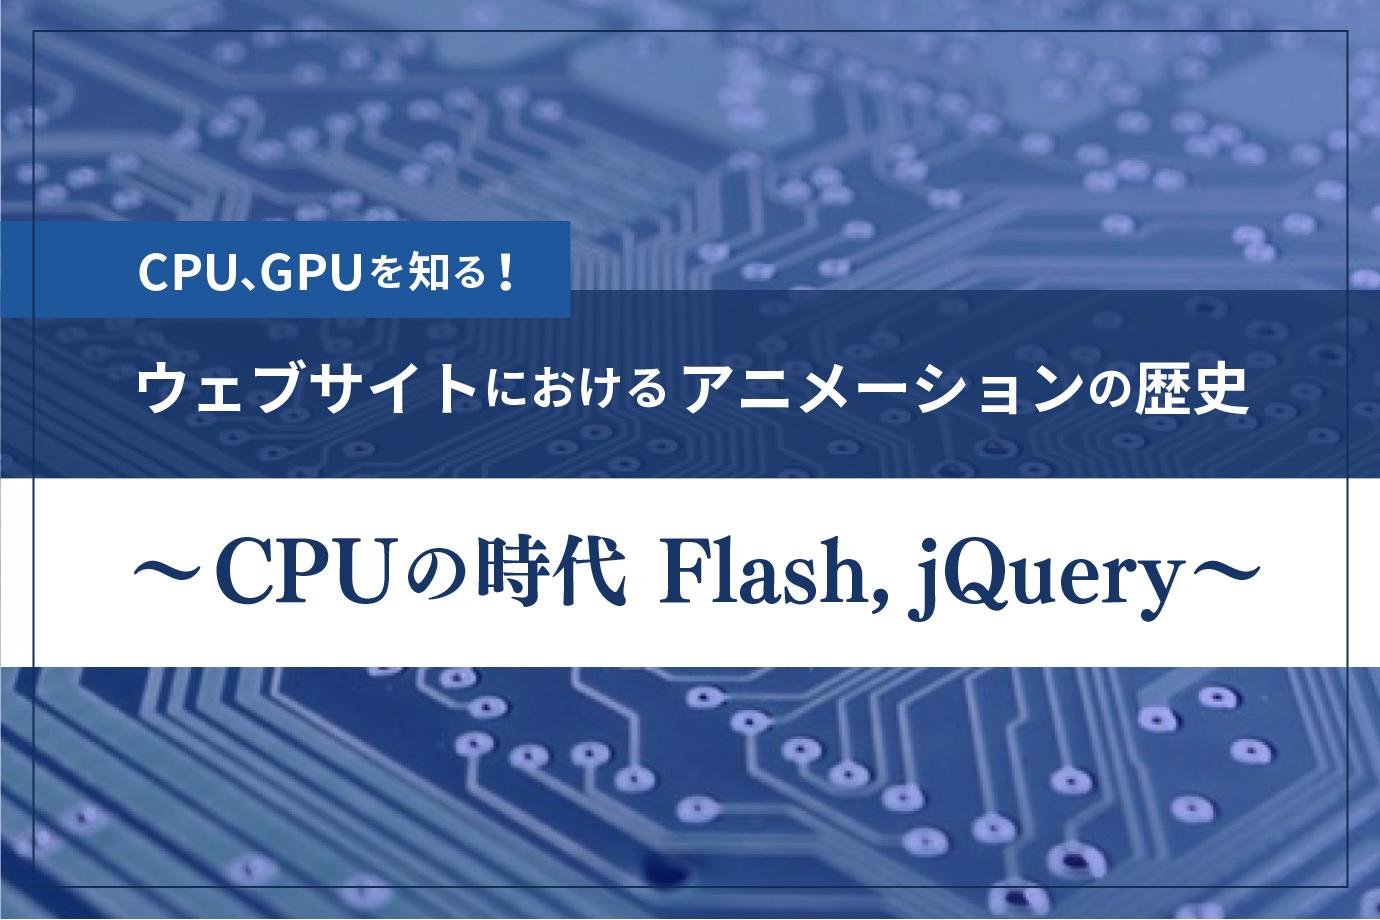 CPU、GPUを知る!『ウェブサイトにおけるアニメーションの歴史 〜CPUの時代 Flash、jQuery〜』